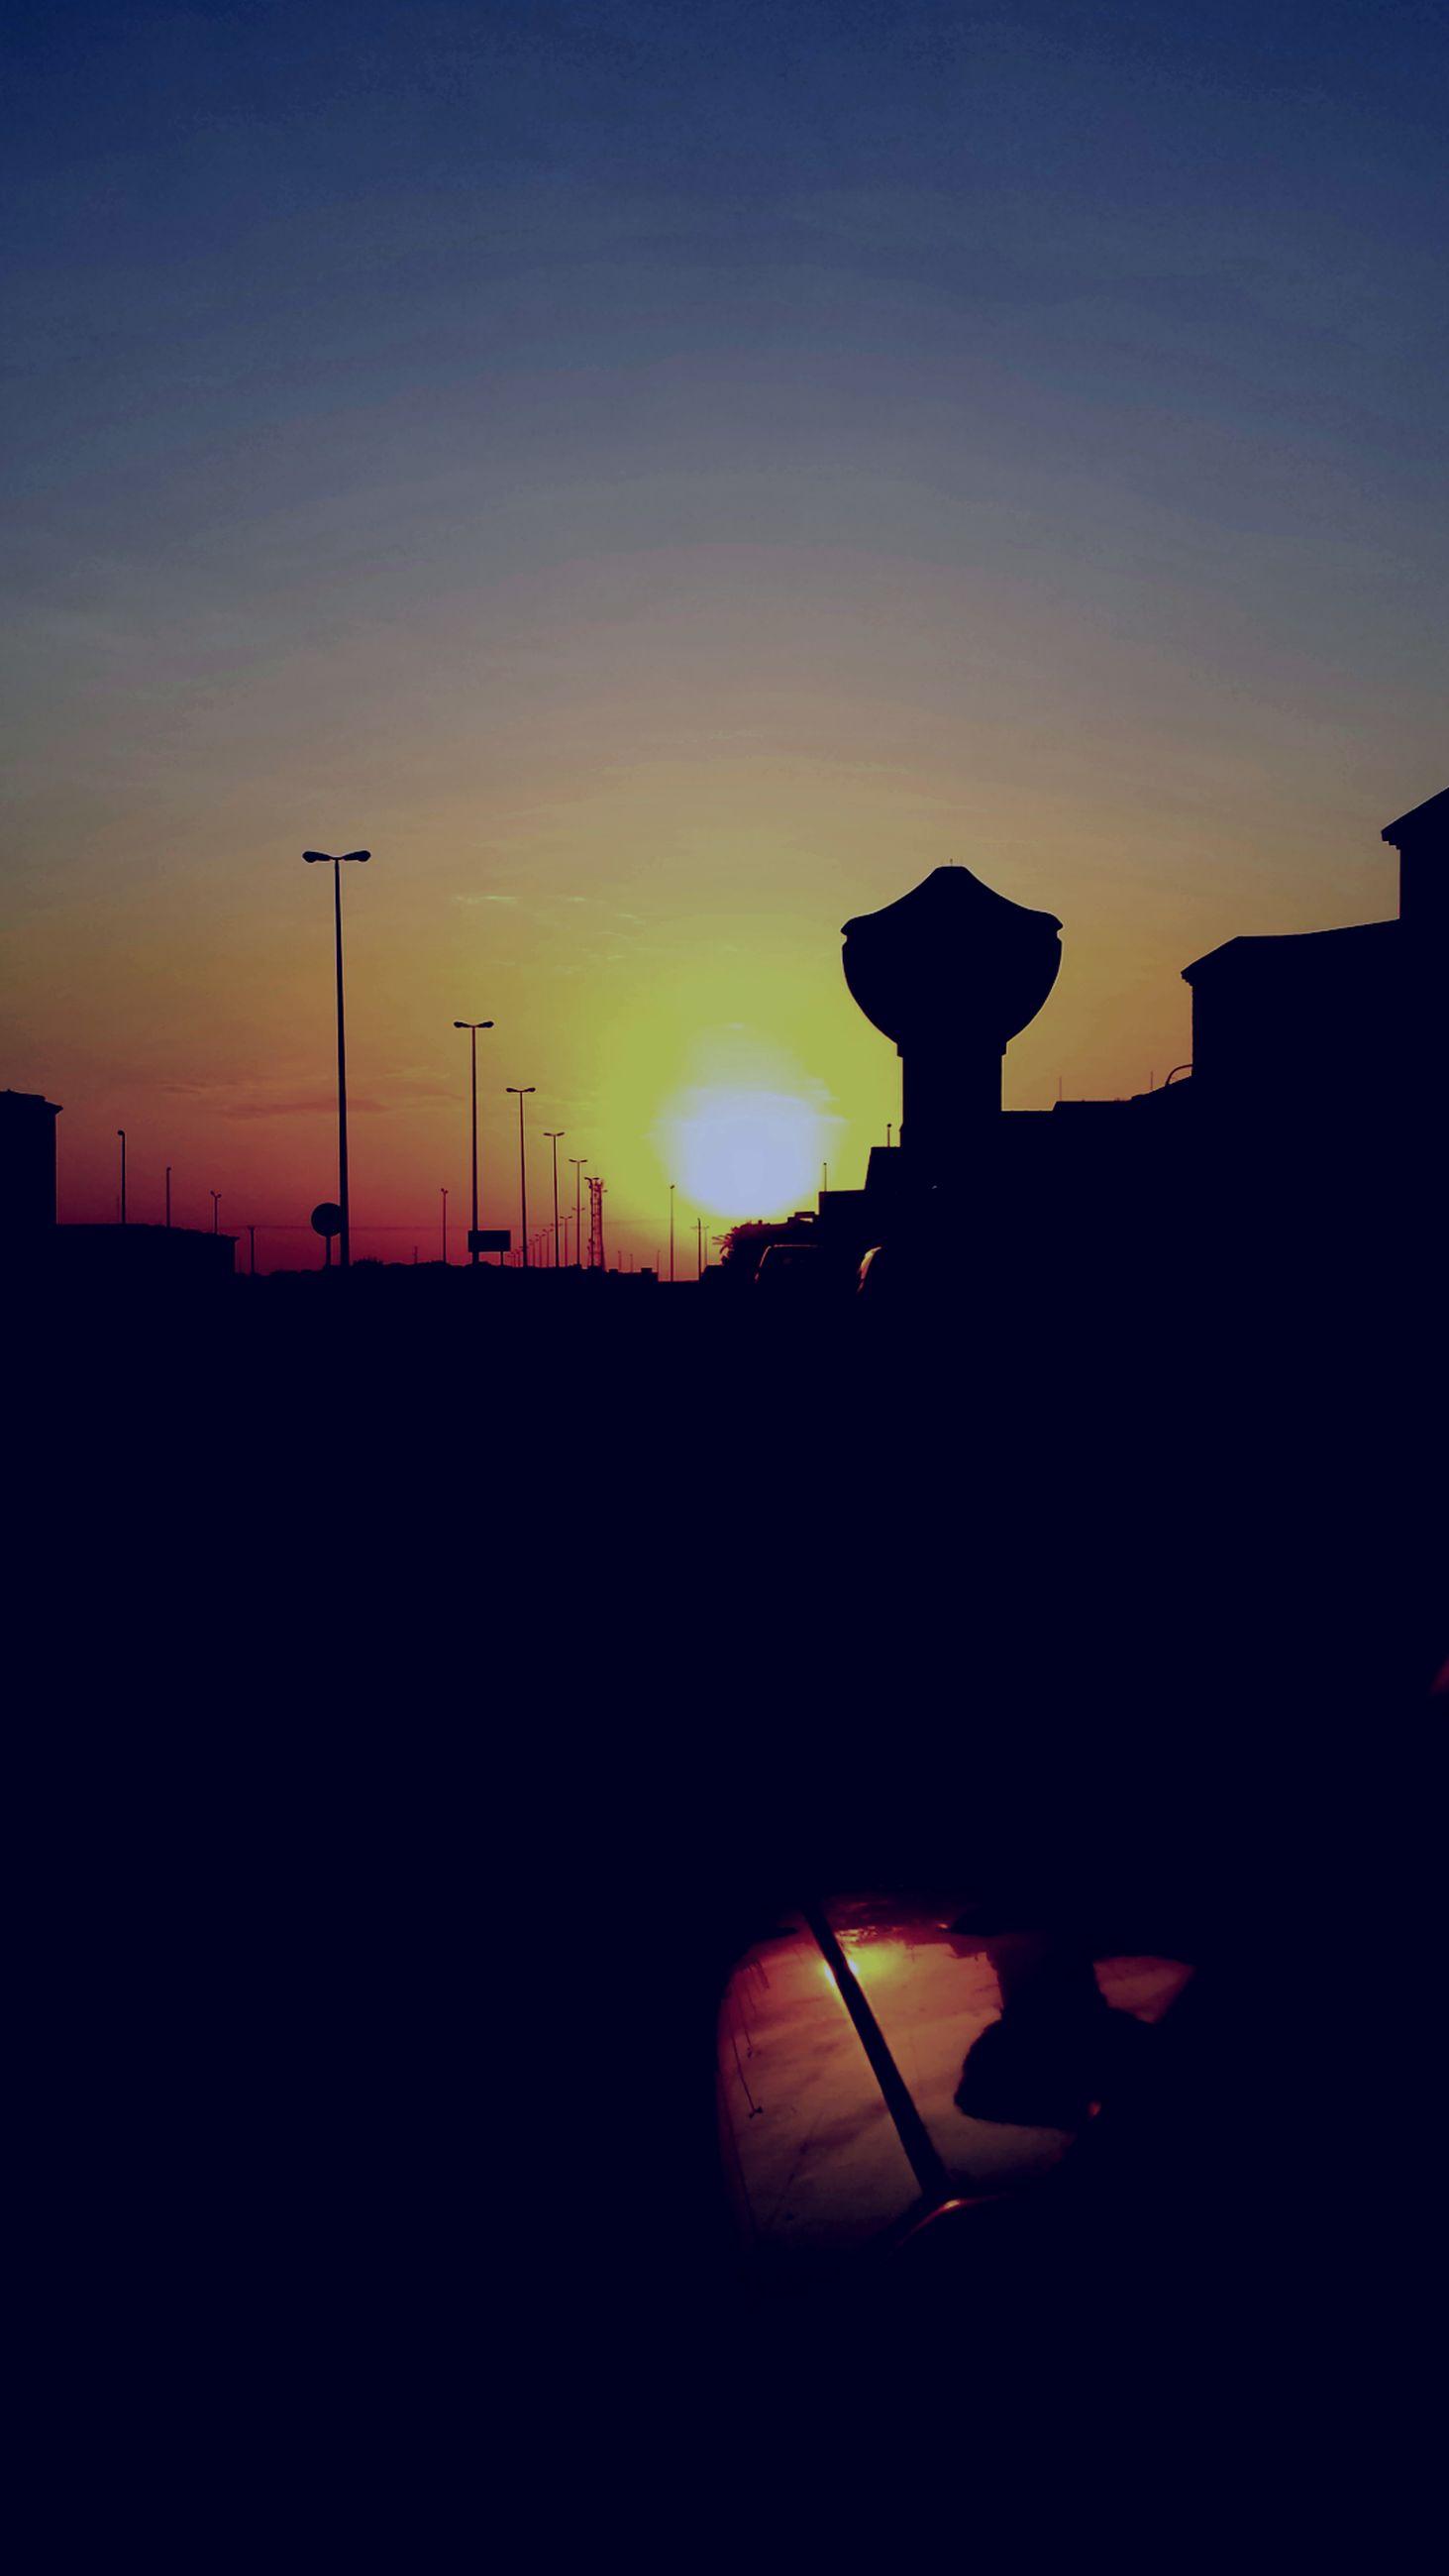 silhouette, sunset, orange color, sky, copy space, outline, unrecognizable person, men, sun, dark, dusk, clear sky, lifestyles, back lit, leisure activity, nature, beauty in nature, outdoors